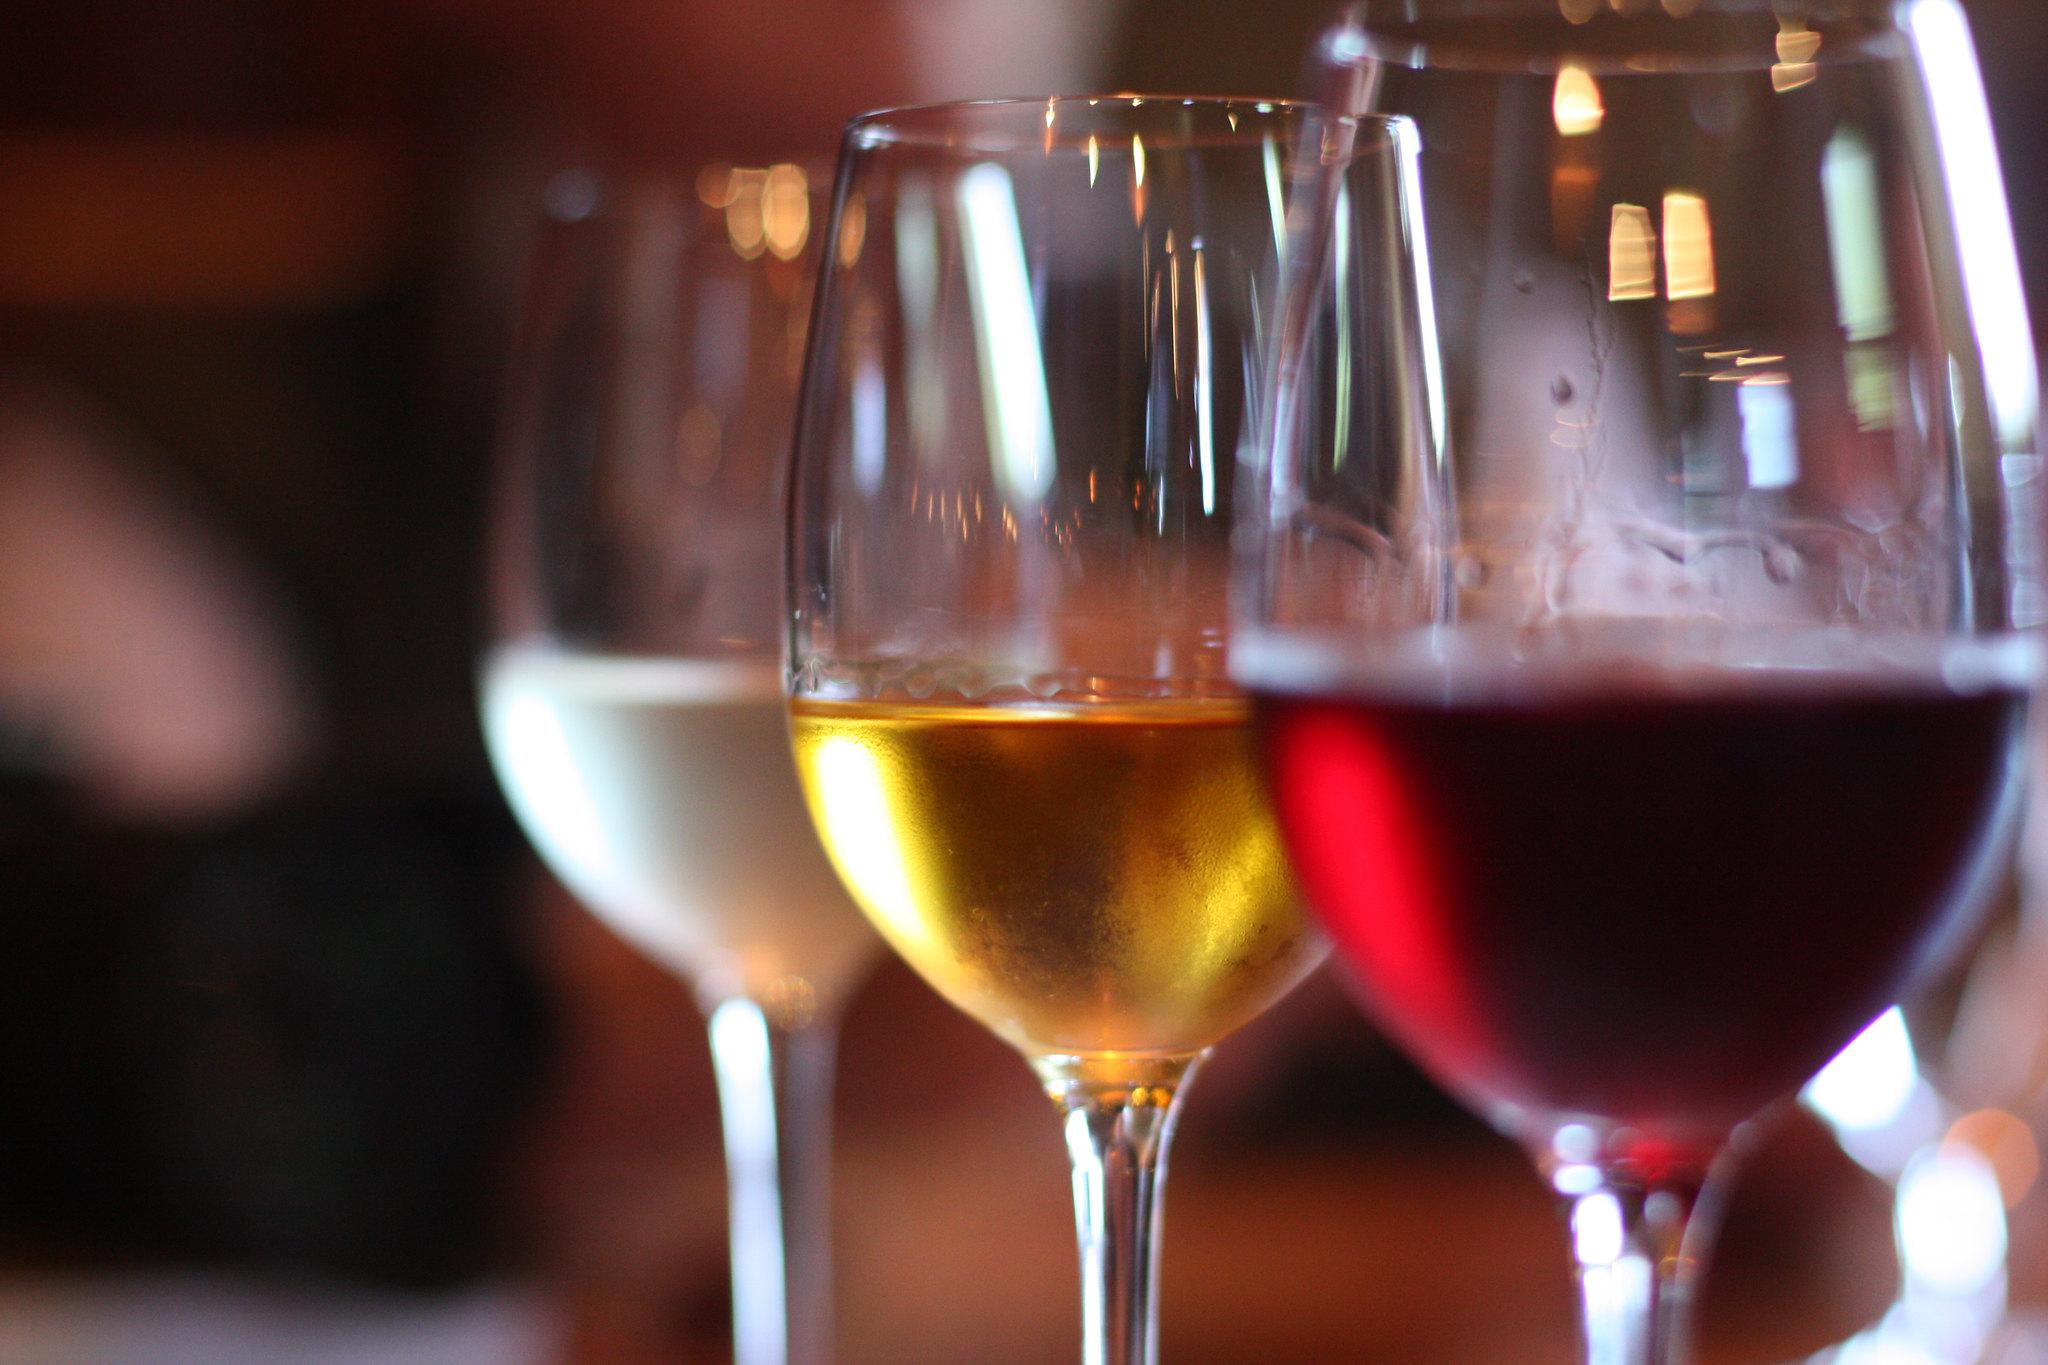 wines, wine pairing, oil pairings, vinegar pairings, chardonnay vinaigrette, extra virgin olive oil, infused olive oil, infused vinegar, flavored vinegar, oviedo olive oil, oviedo olive oil company